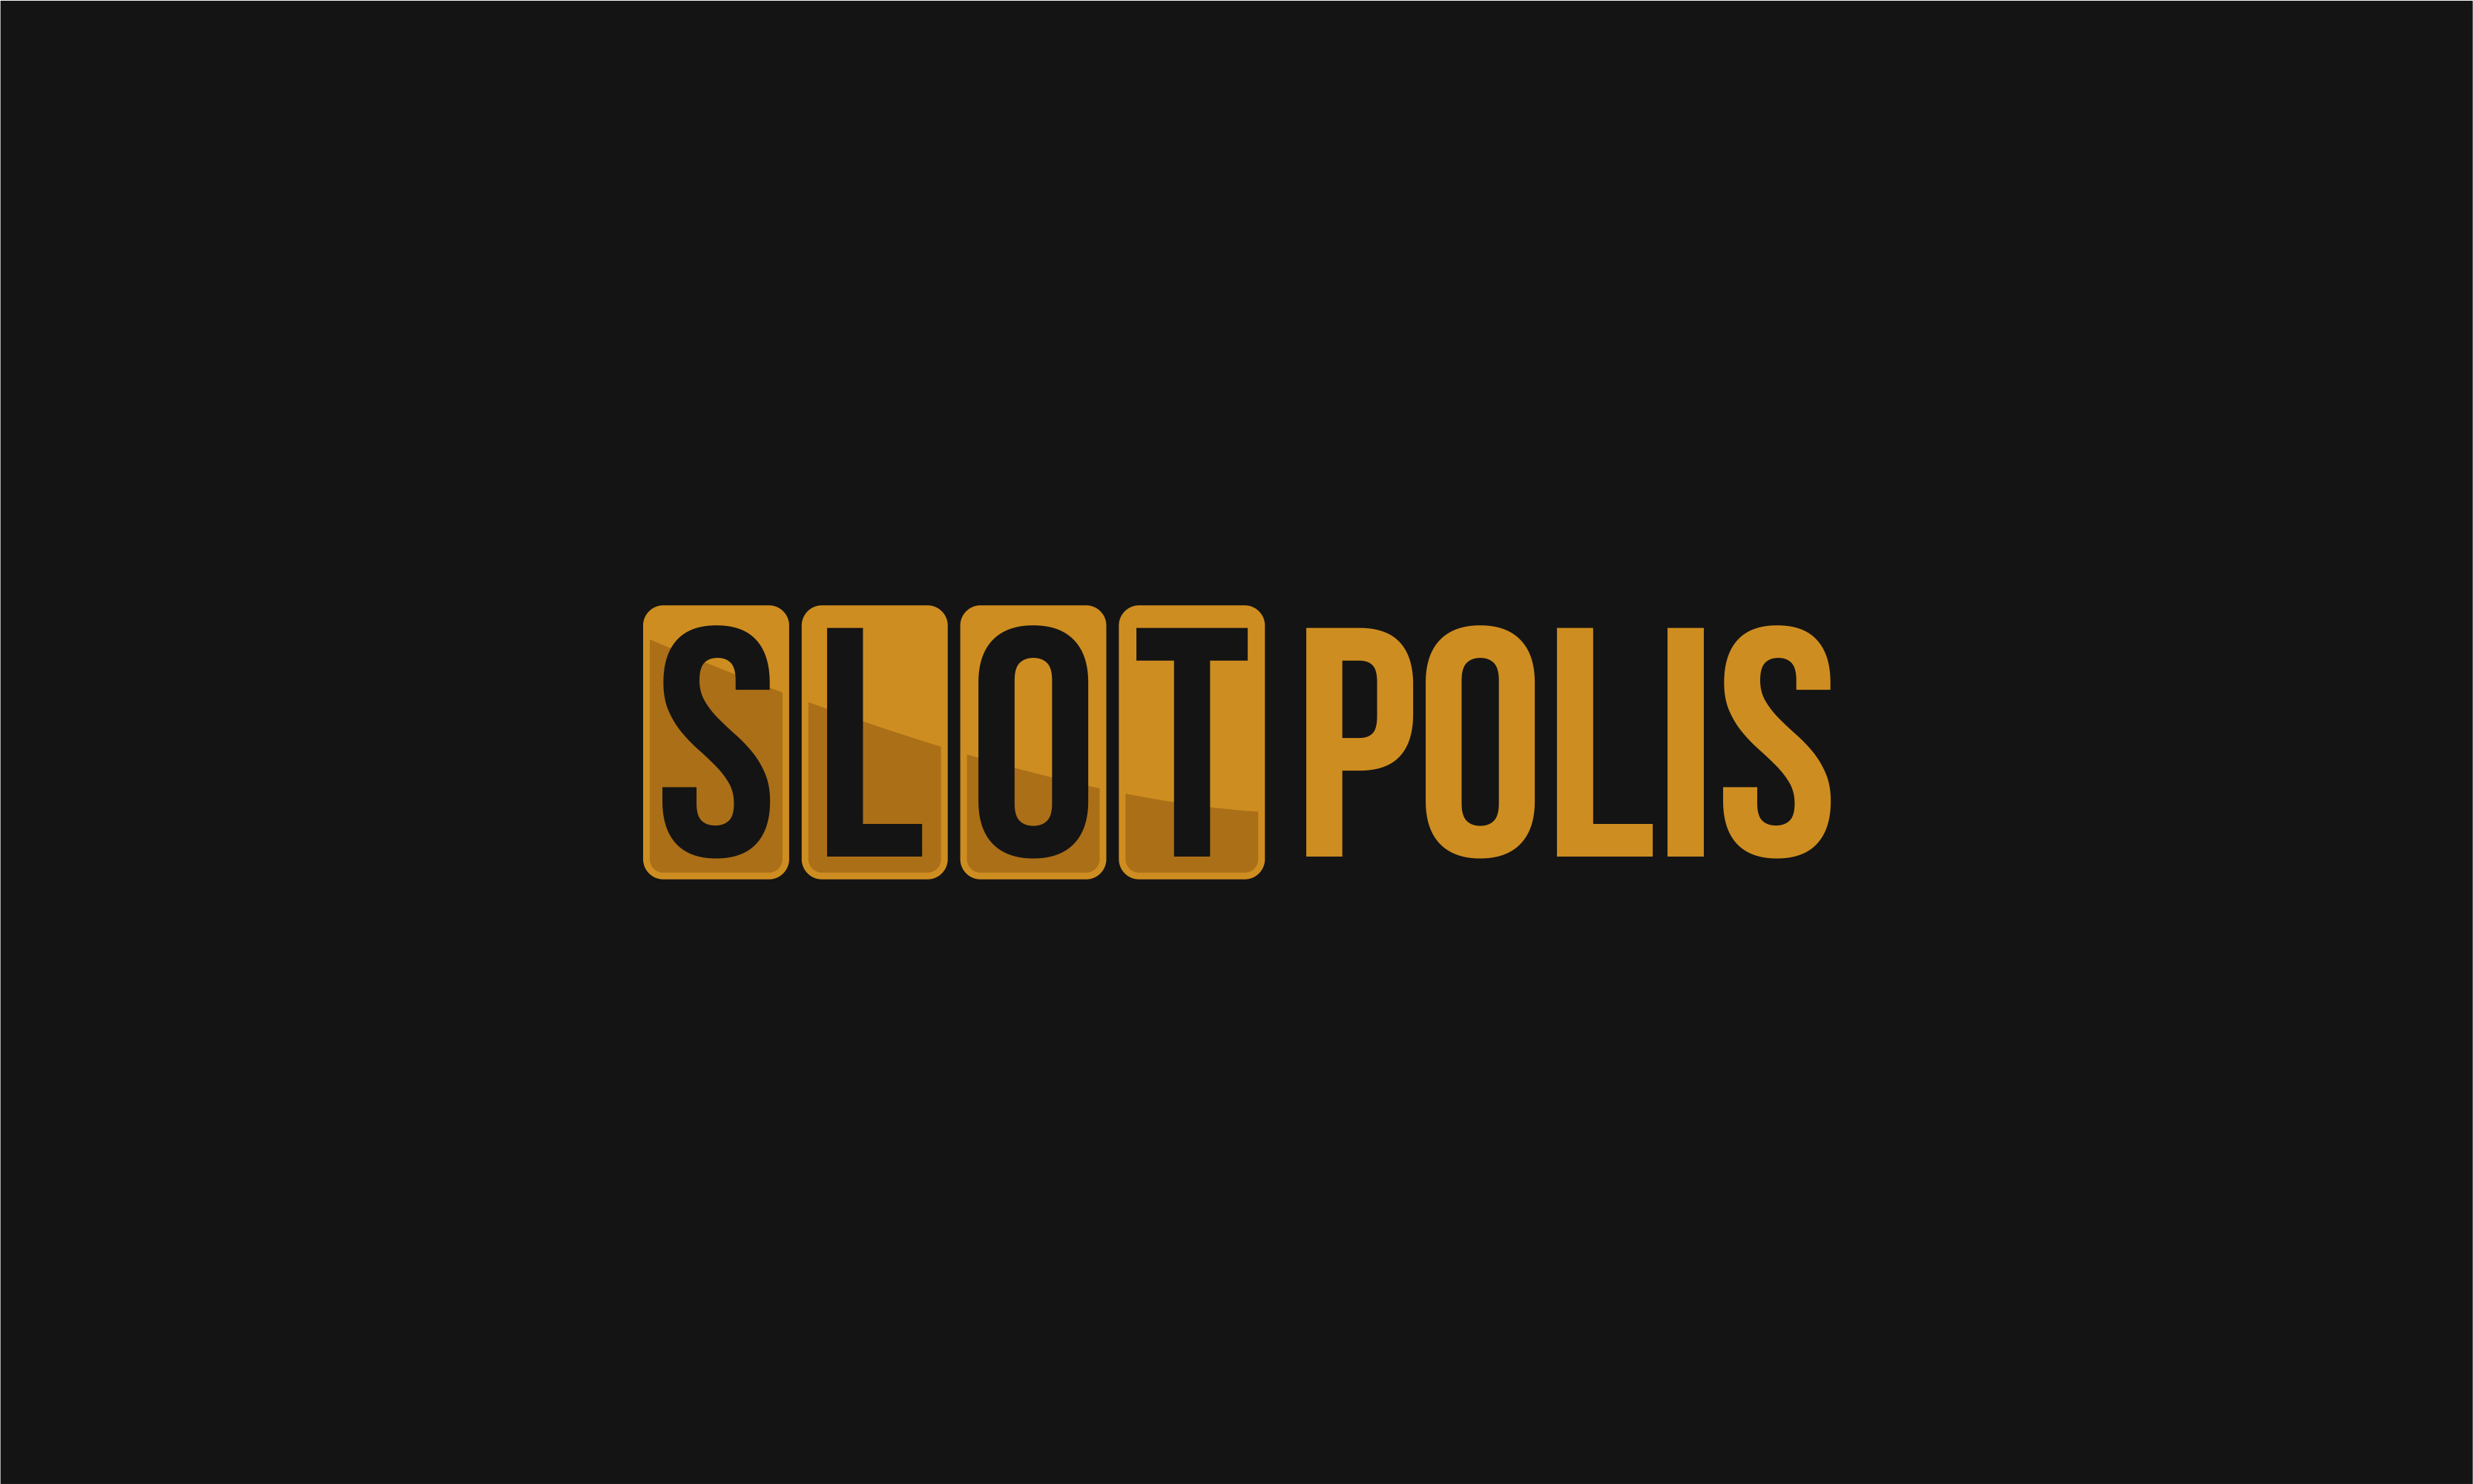 Slotpolis